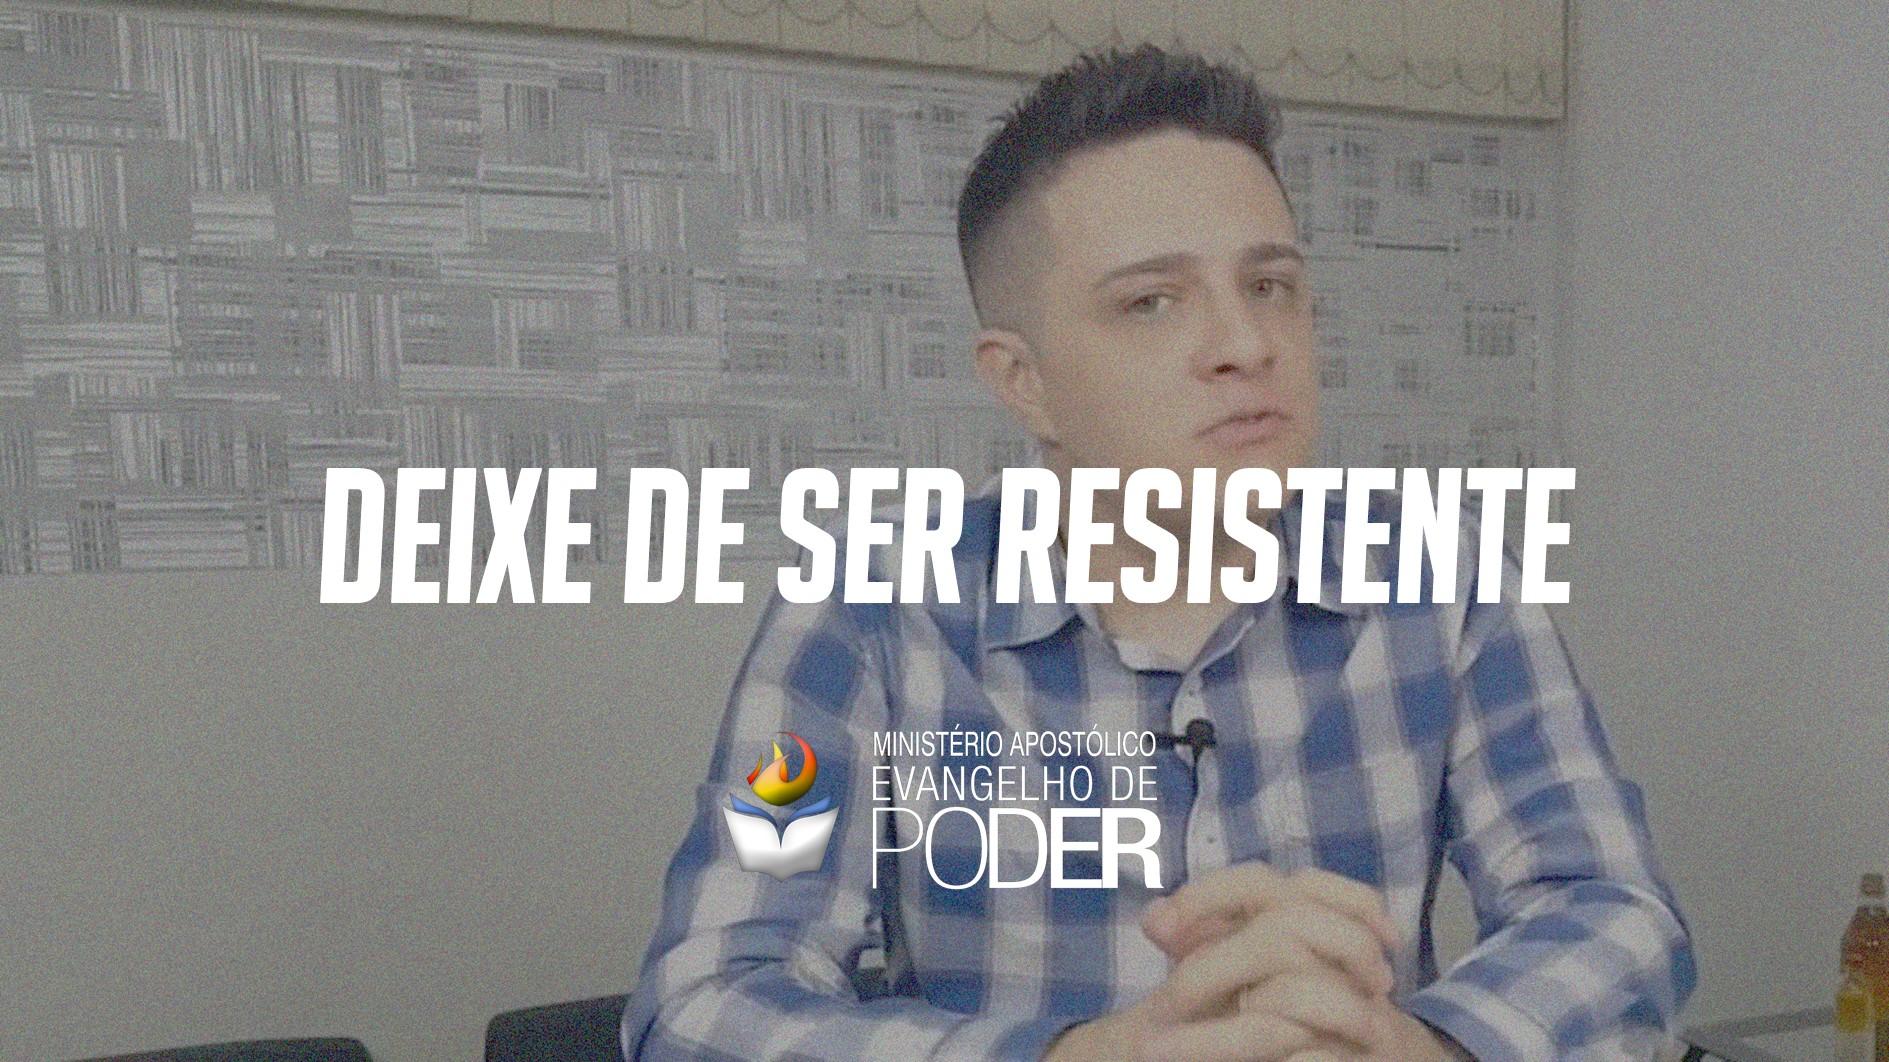 DEIXE DE SER RESISTENTE